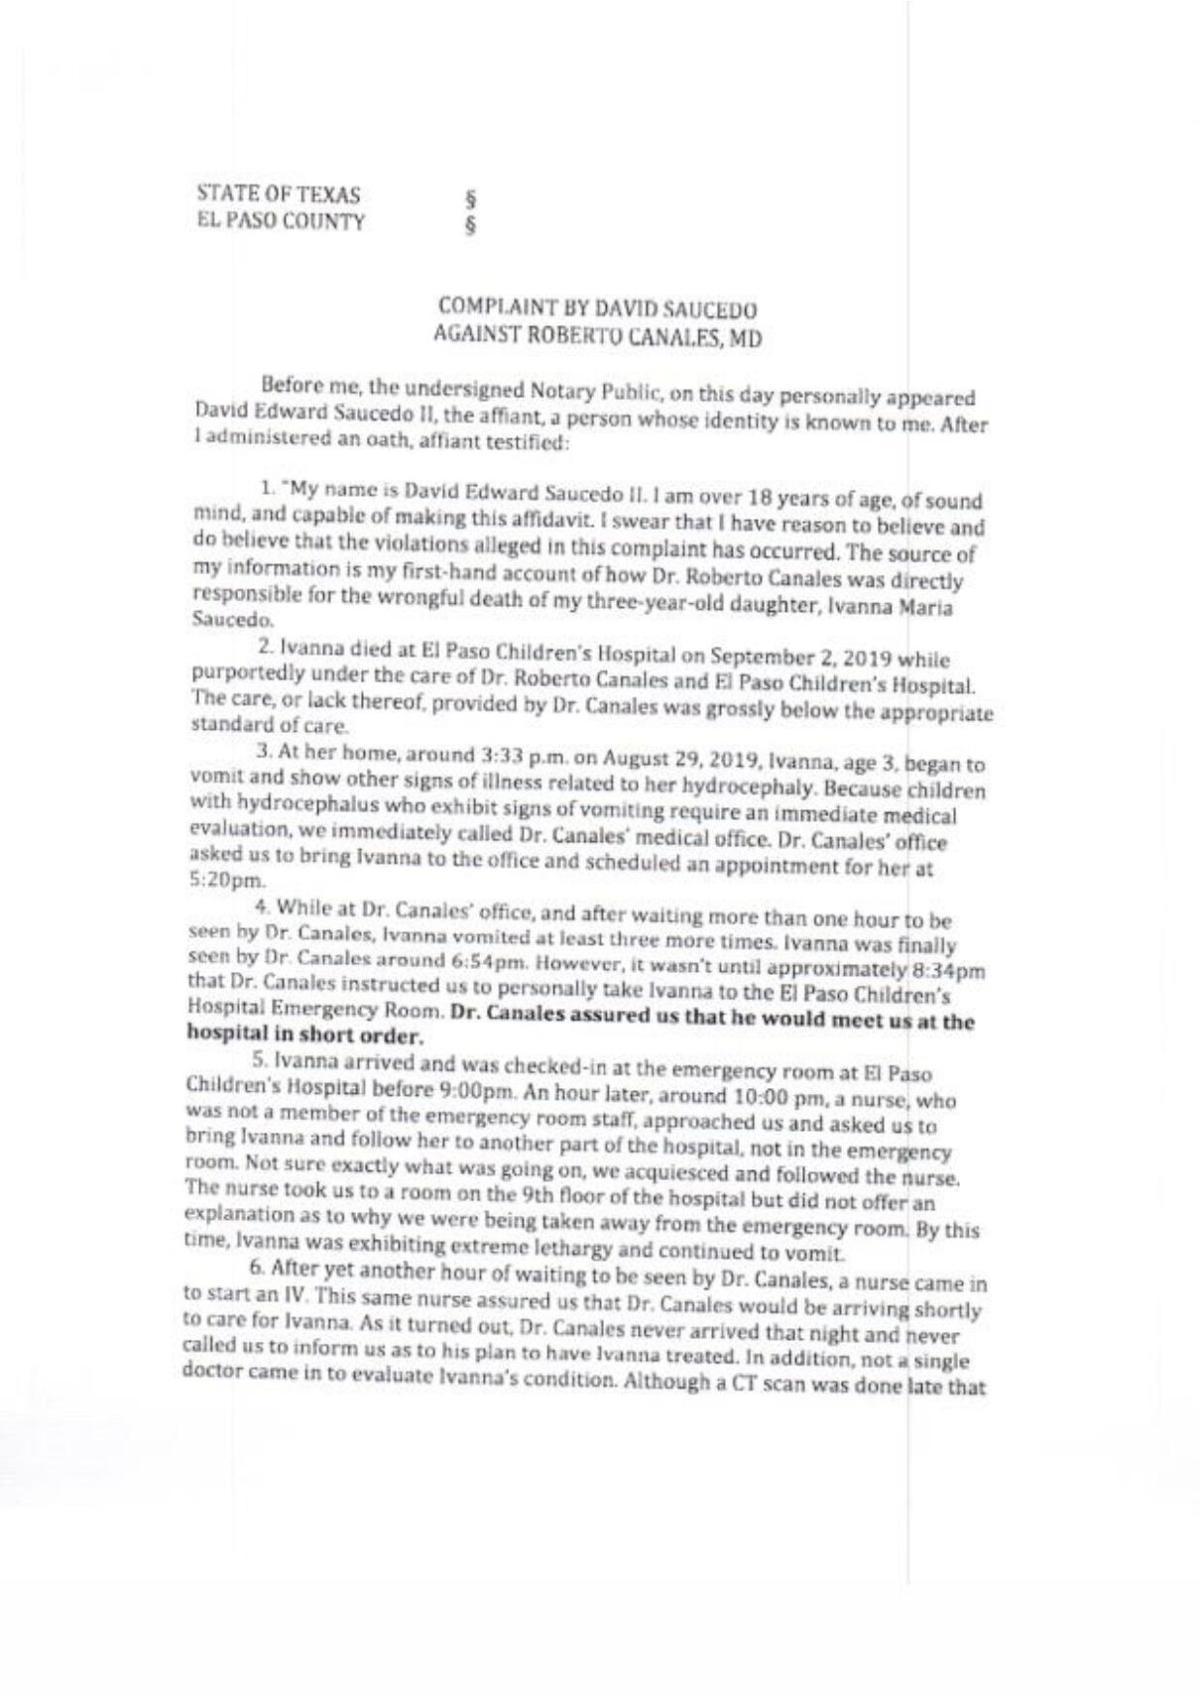 David Saucedo TMB complaint